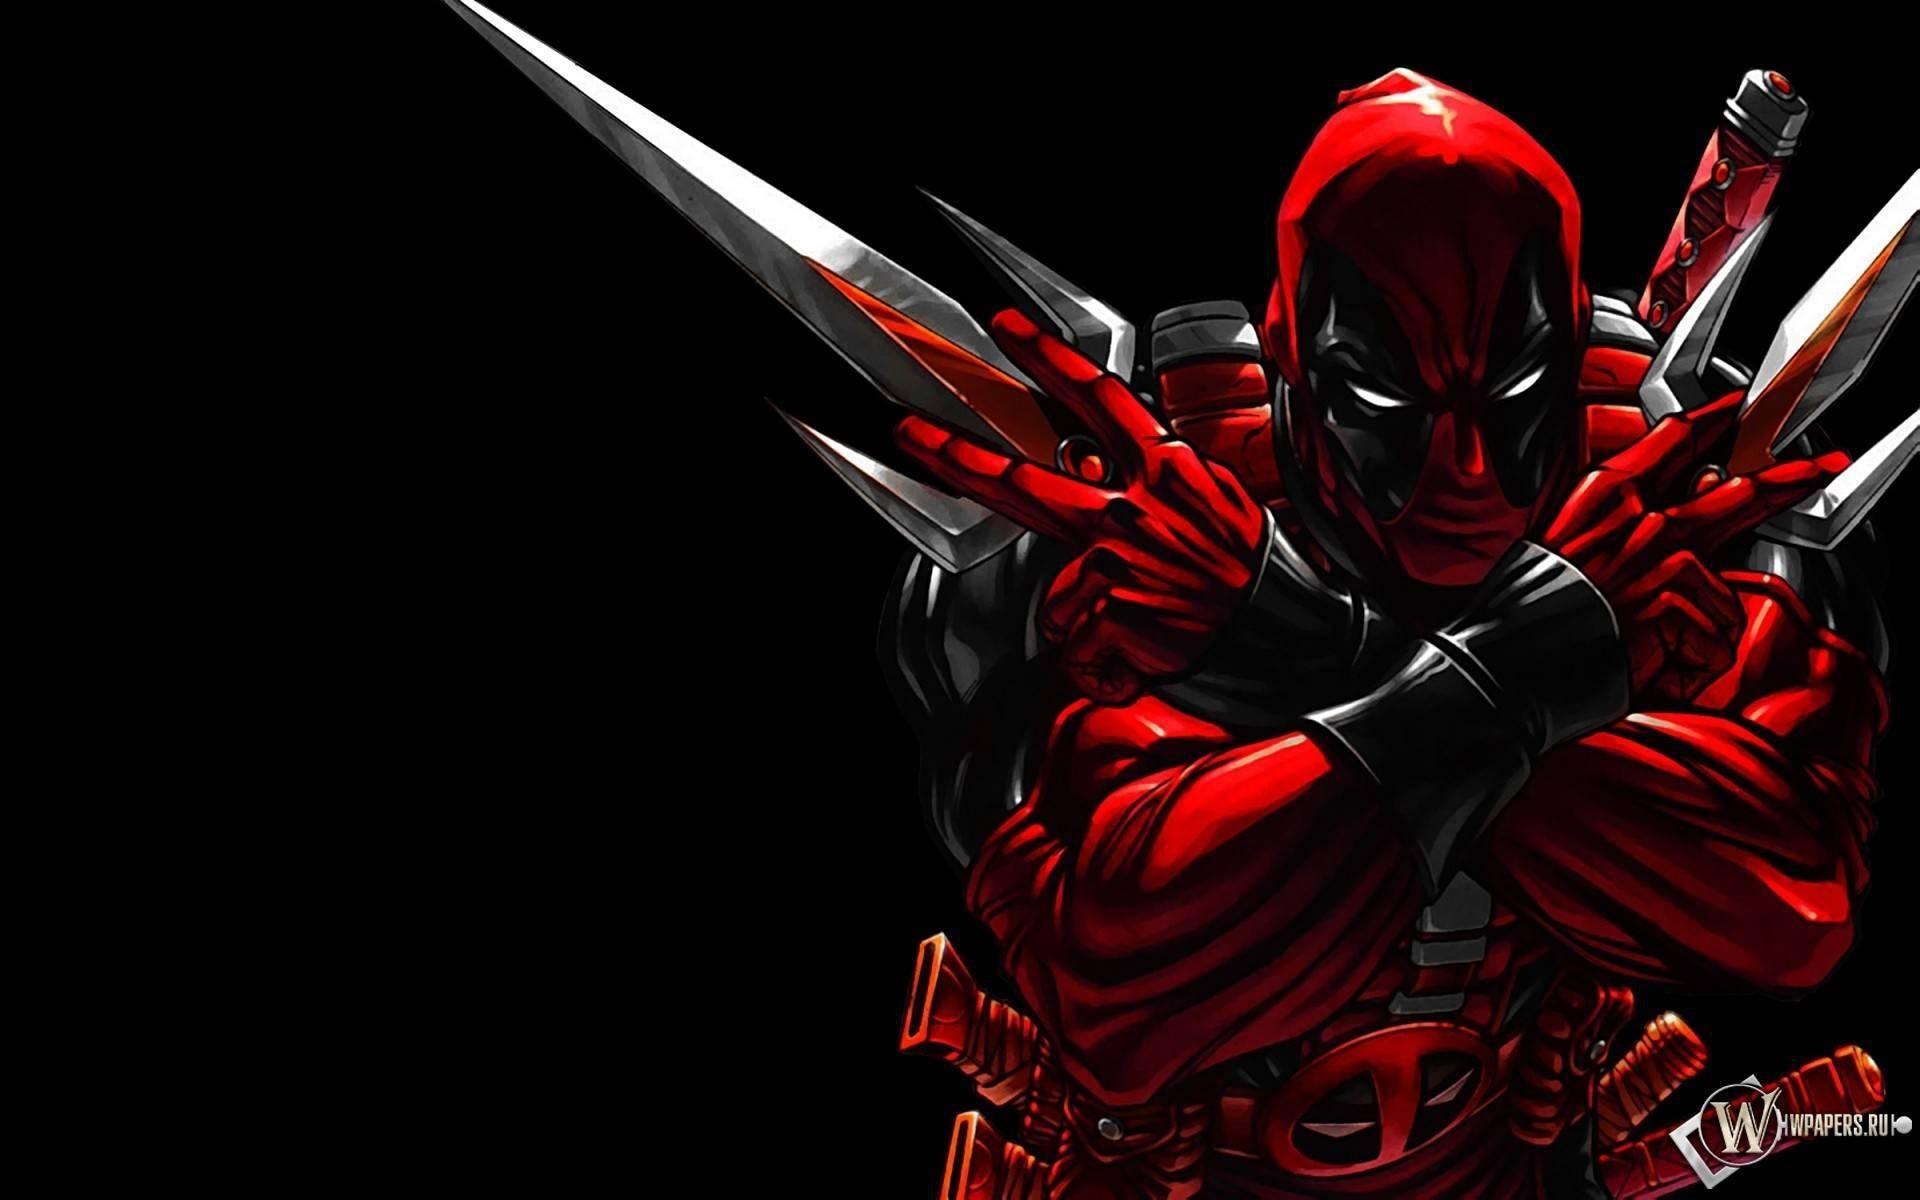 deadpool hd wallpapers 1080p windows | ololoshenka | Pinterest | Deadpool  hd wallpaper, Deadpool hd and Hd wallpaper